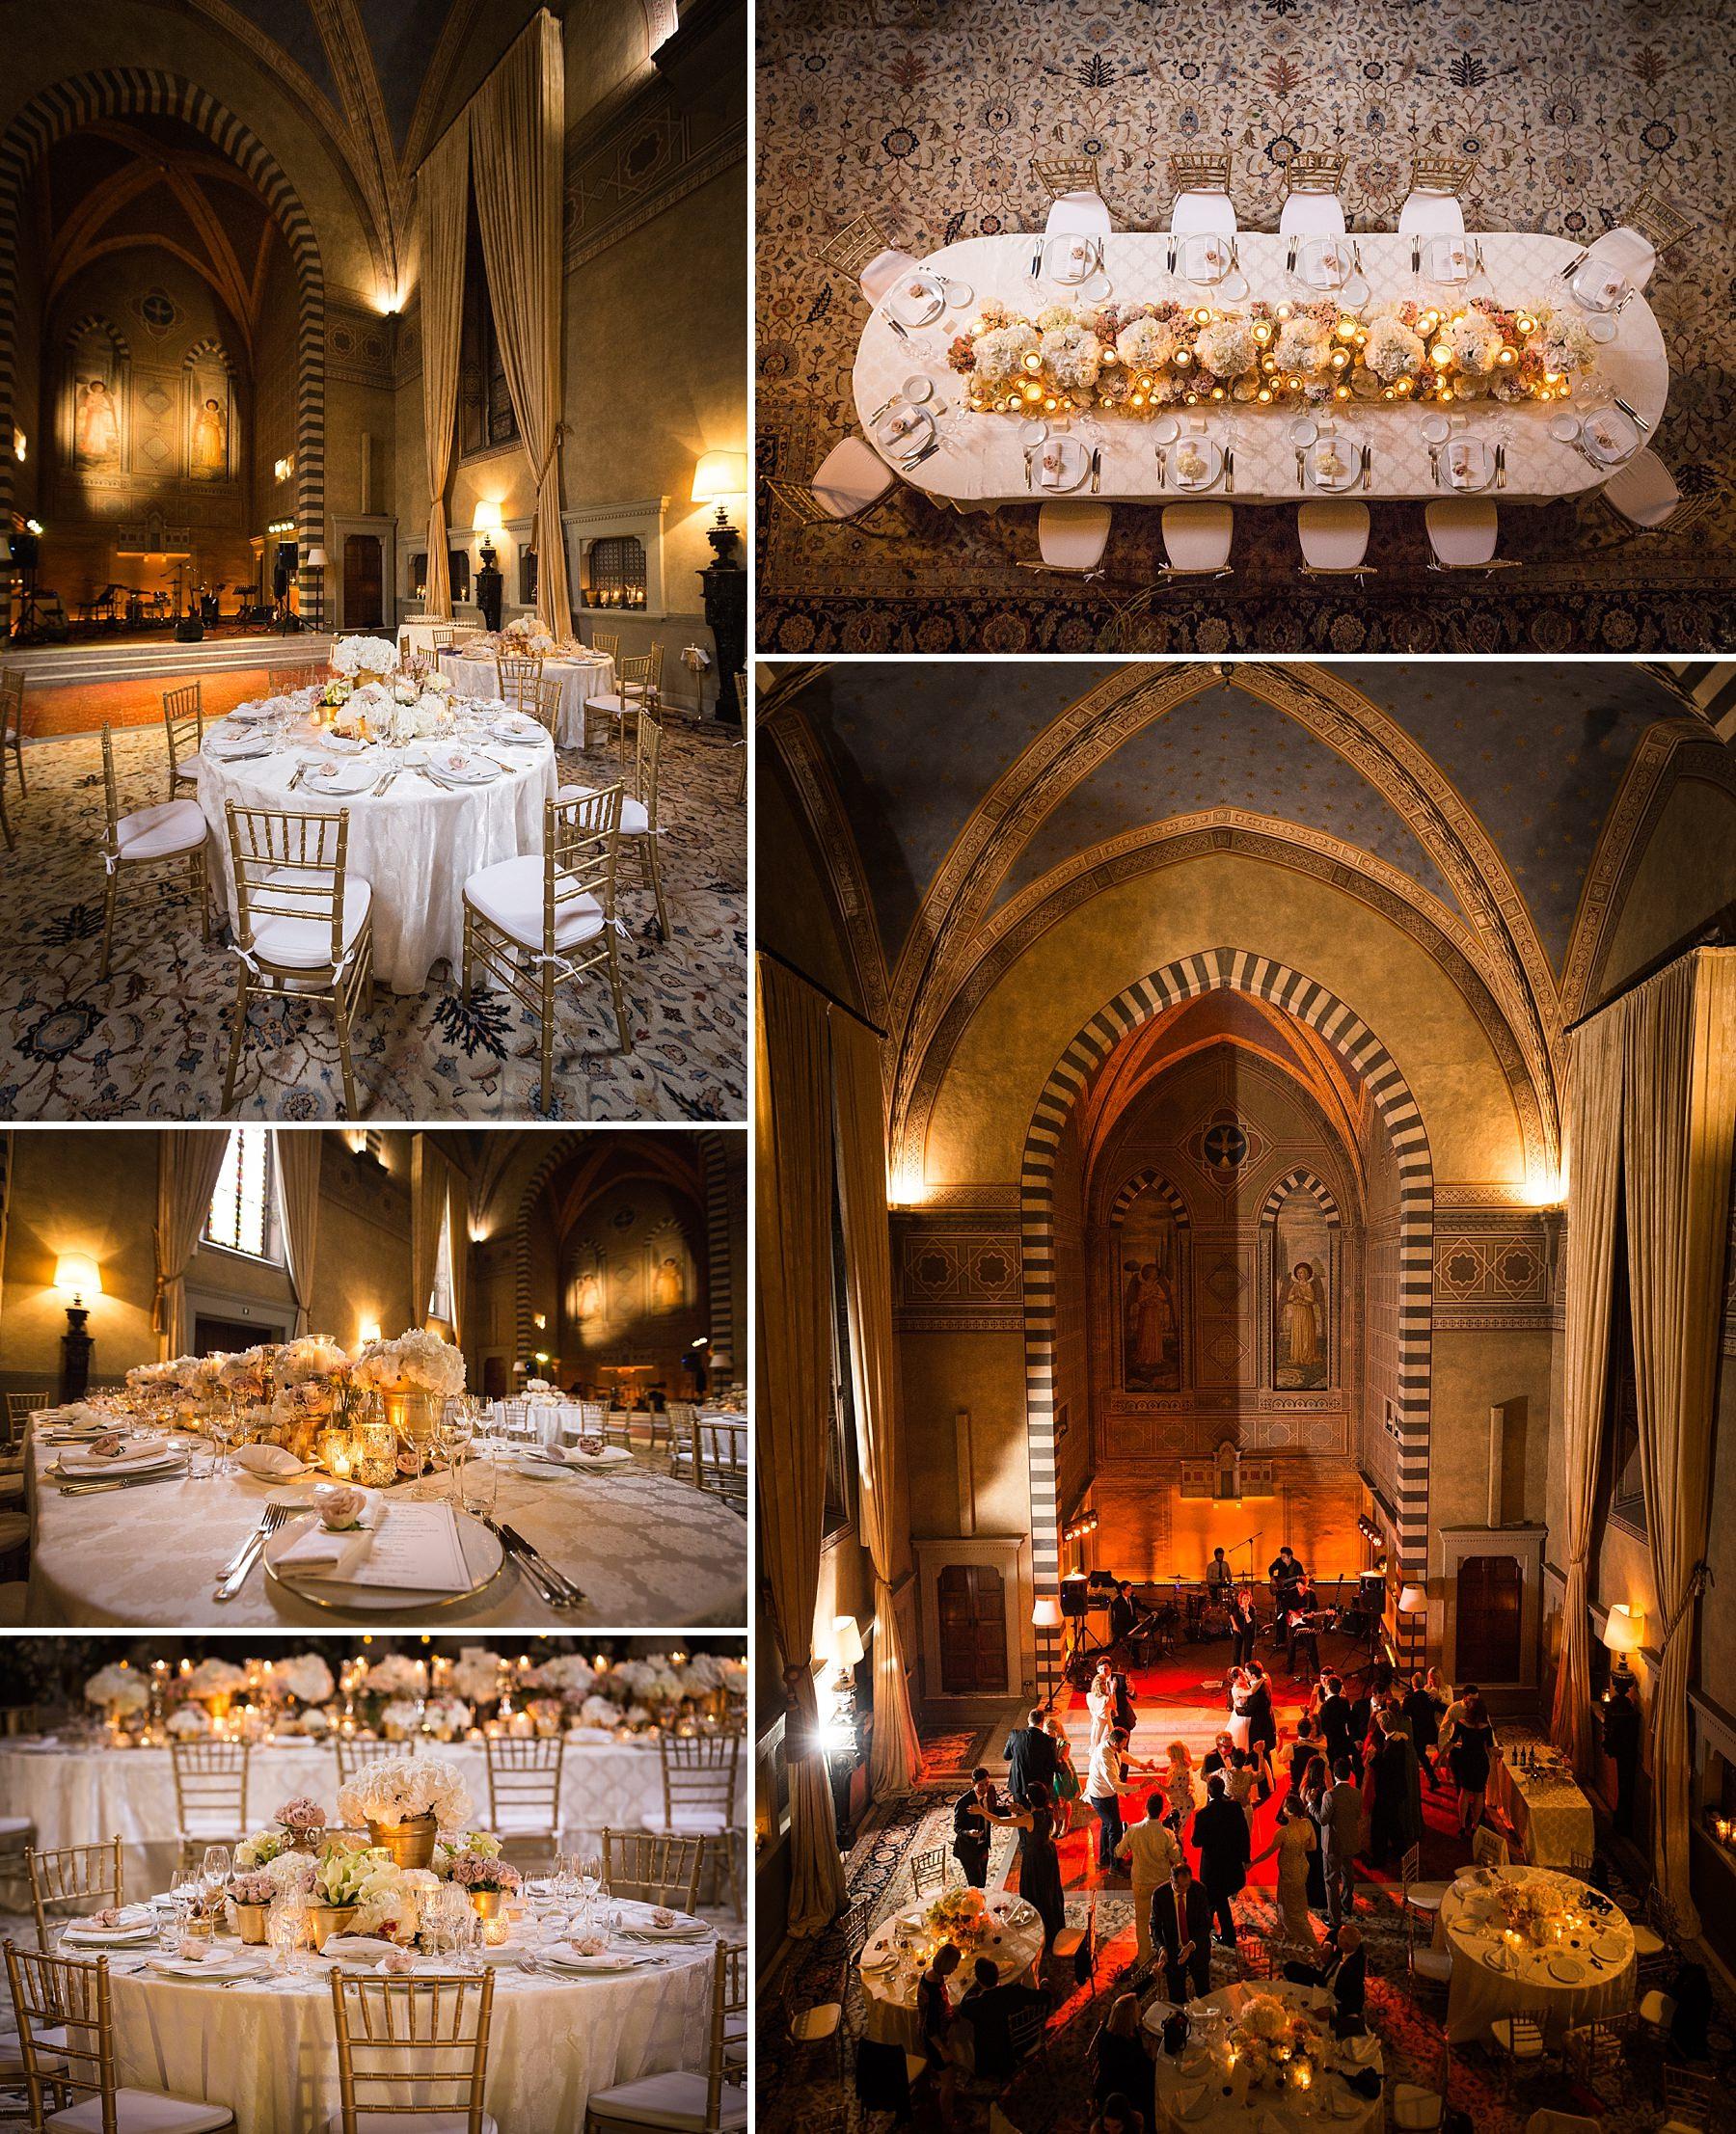 fotografia di matrimonio al Four Seasons a Firenze in Toscana